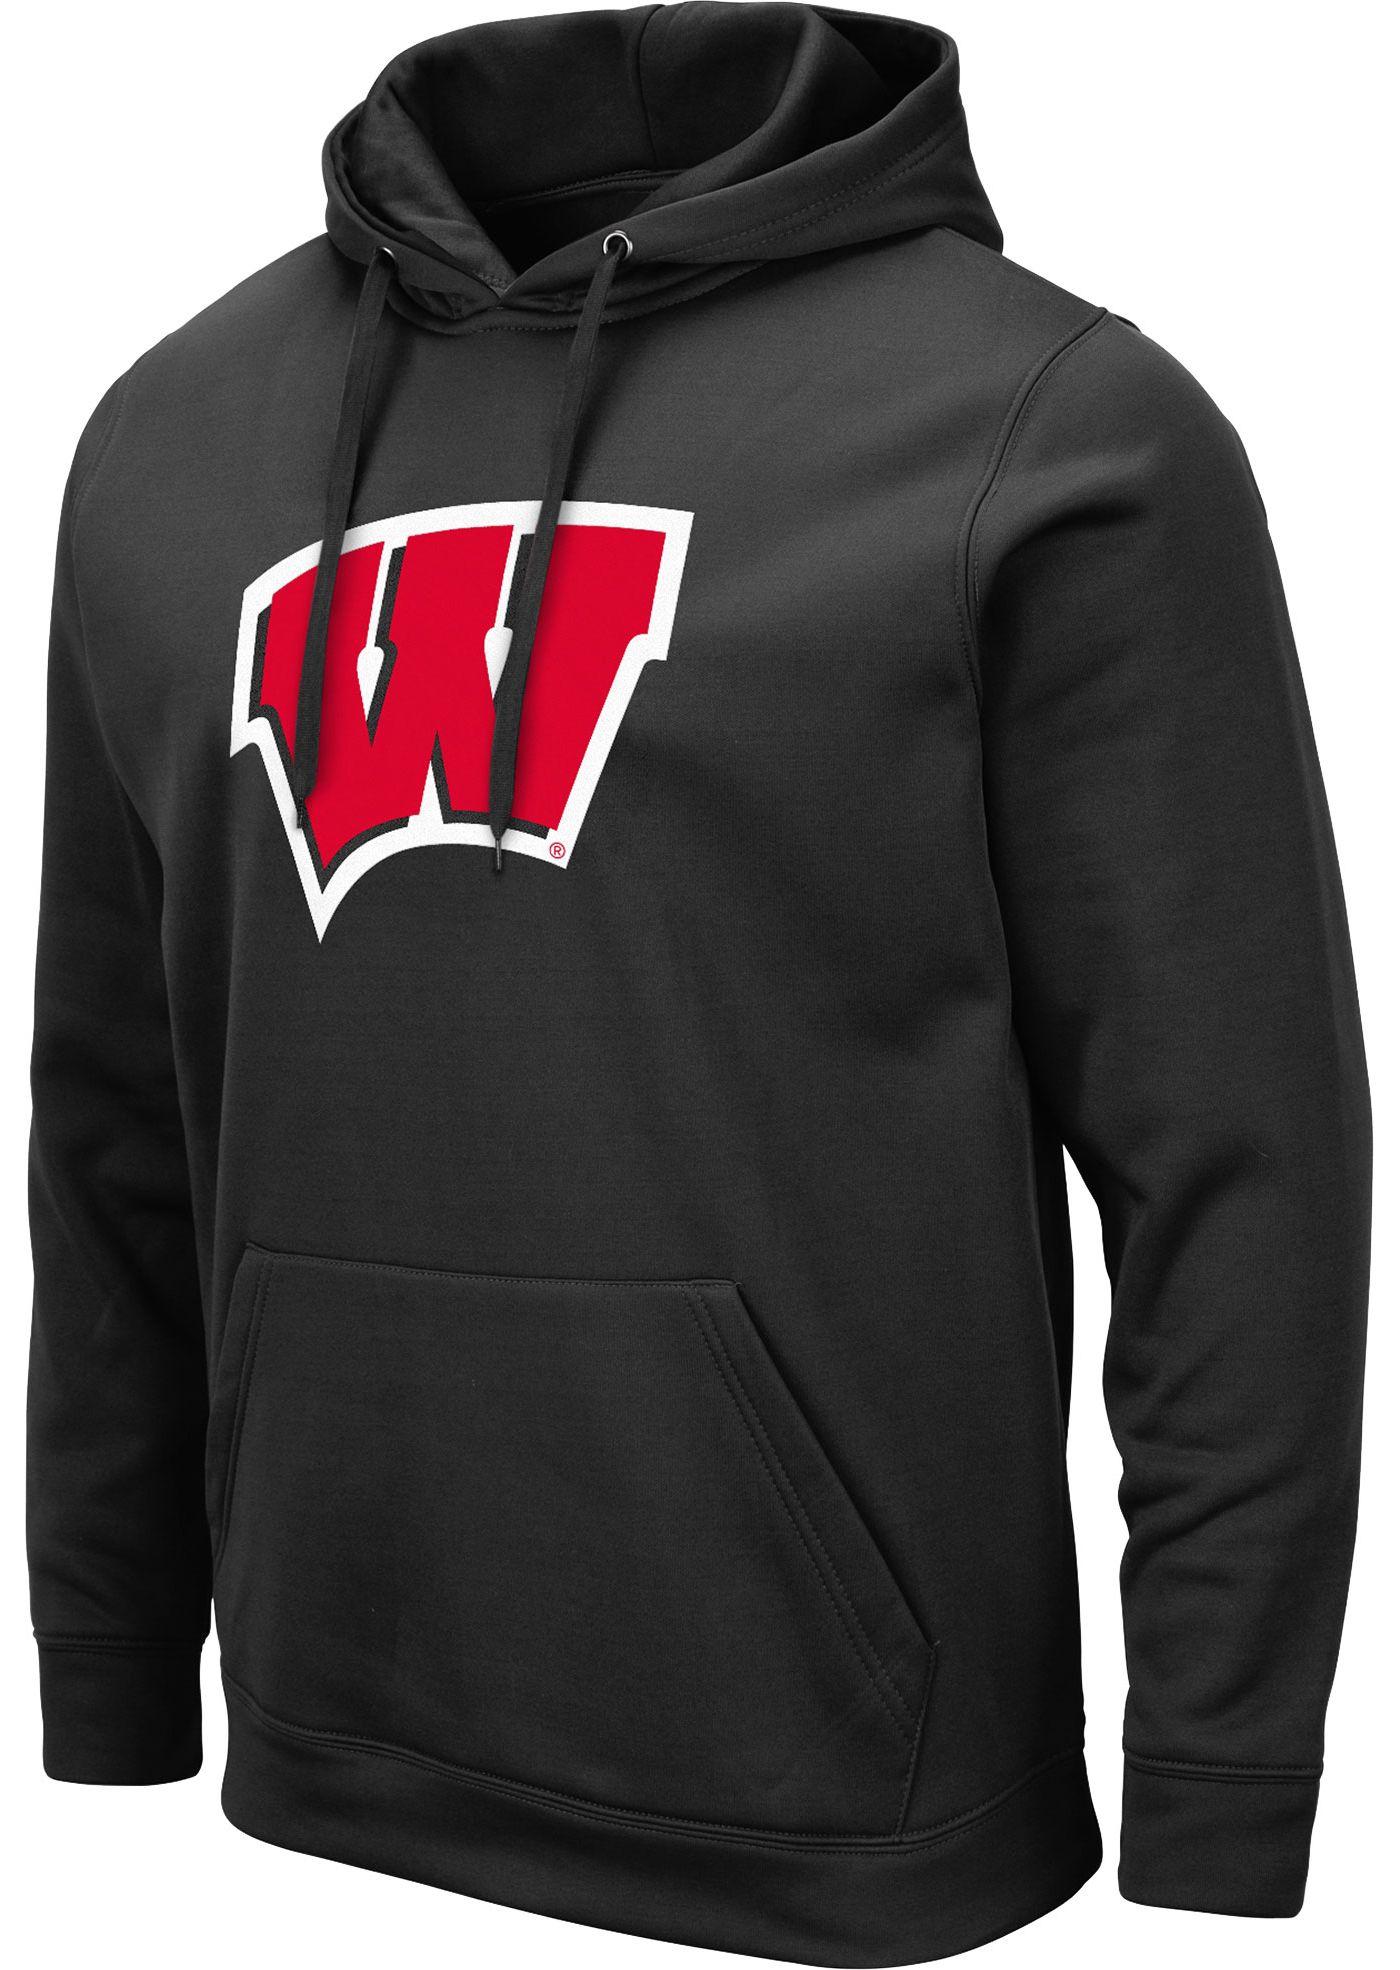 Colosseum Men's Wisconsin Badgers Pullover Black Hoodie